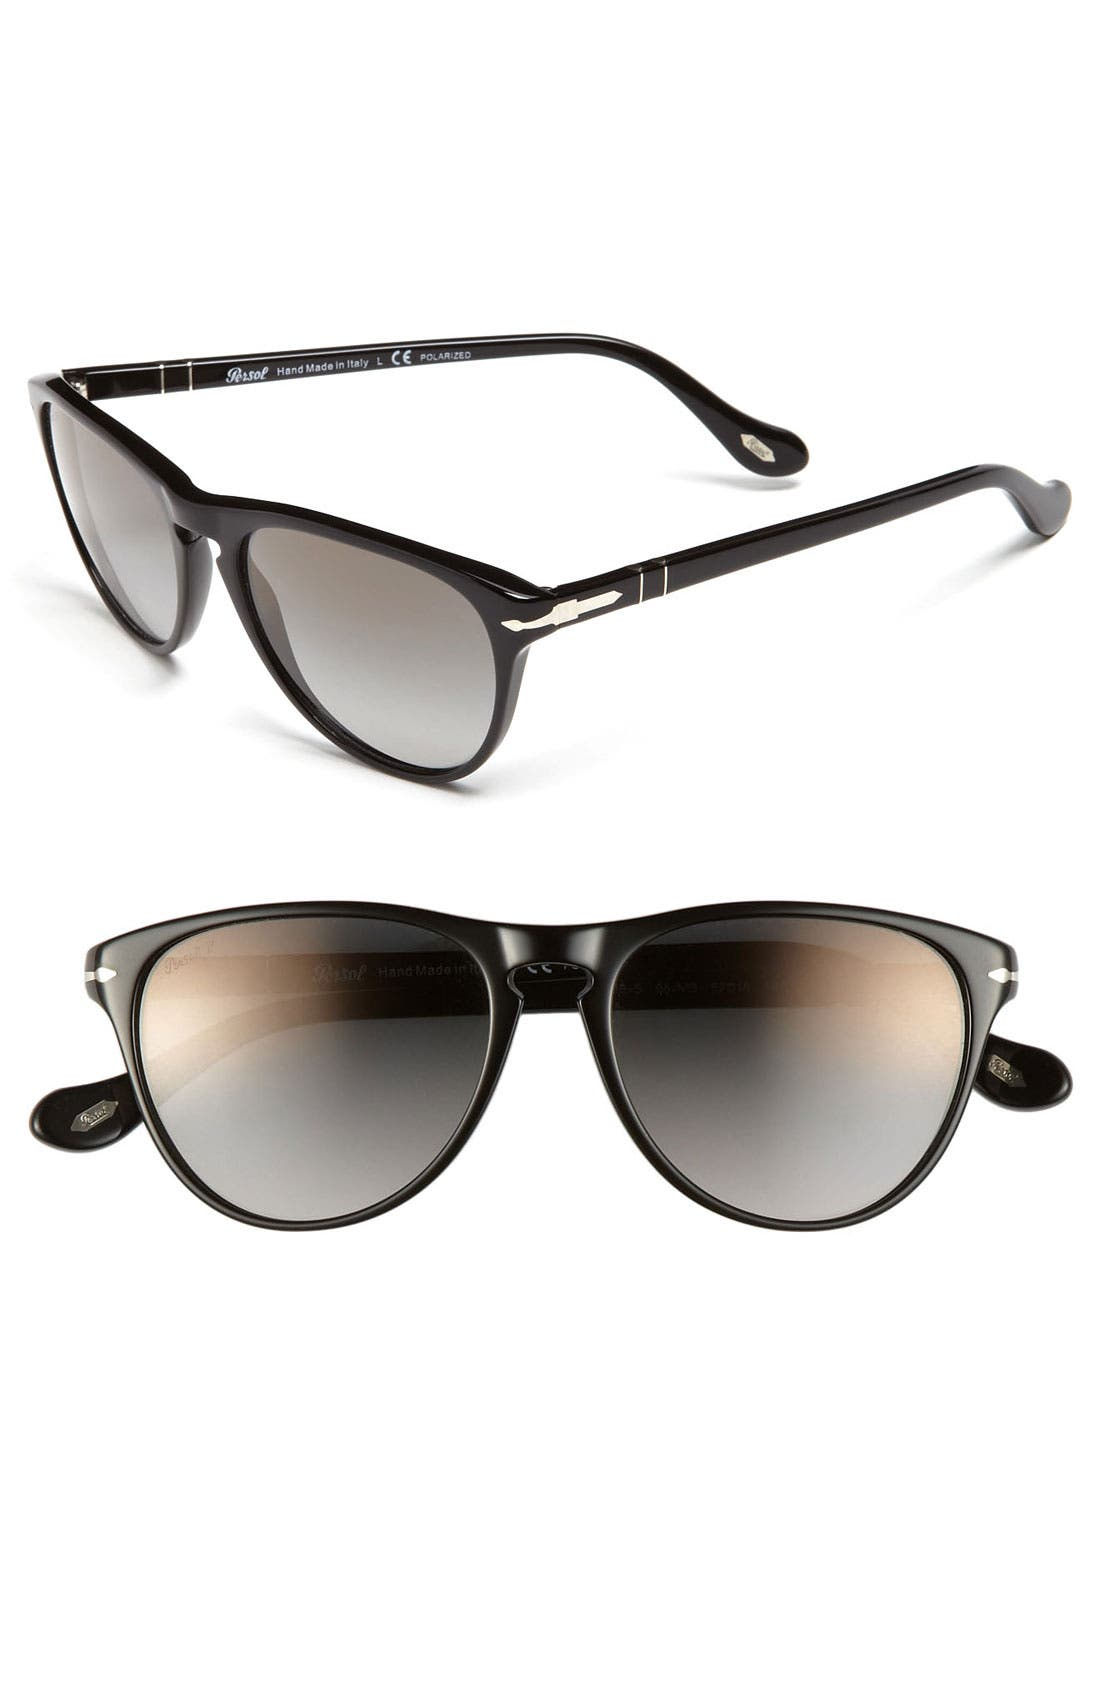 Alternate Image 1 Selected - Persol 'Suprema' 52mm Polarized Sunglasses